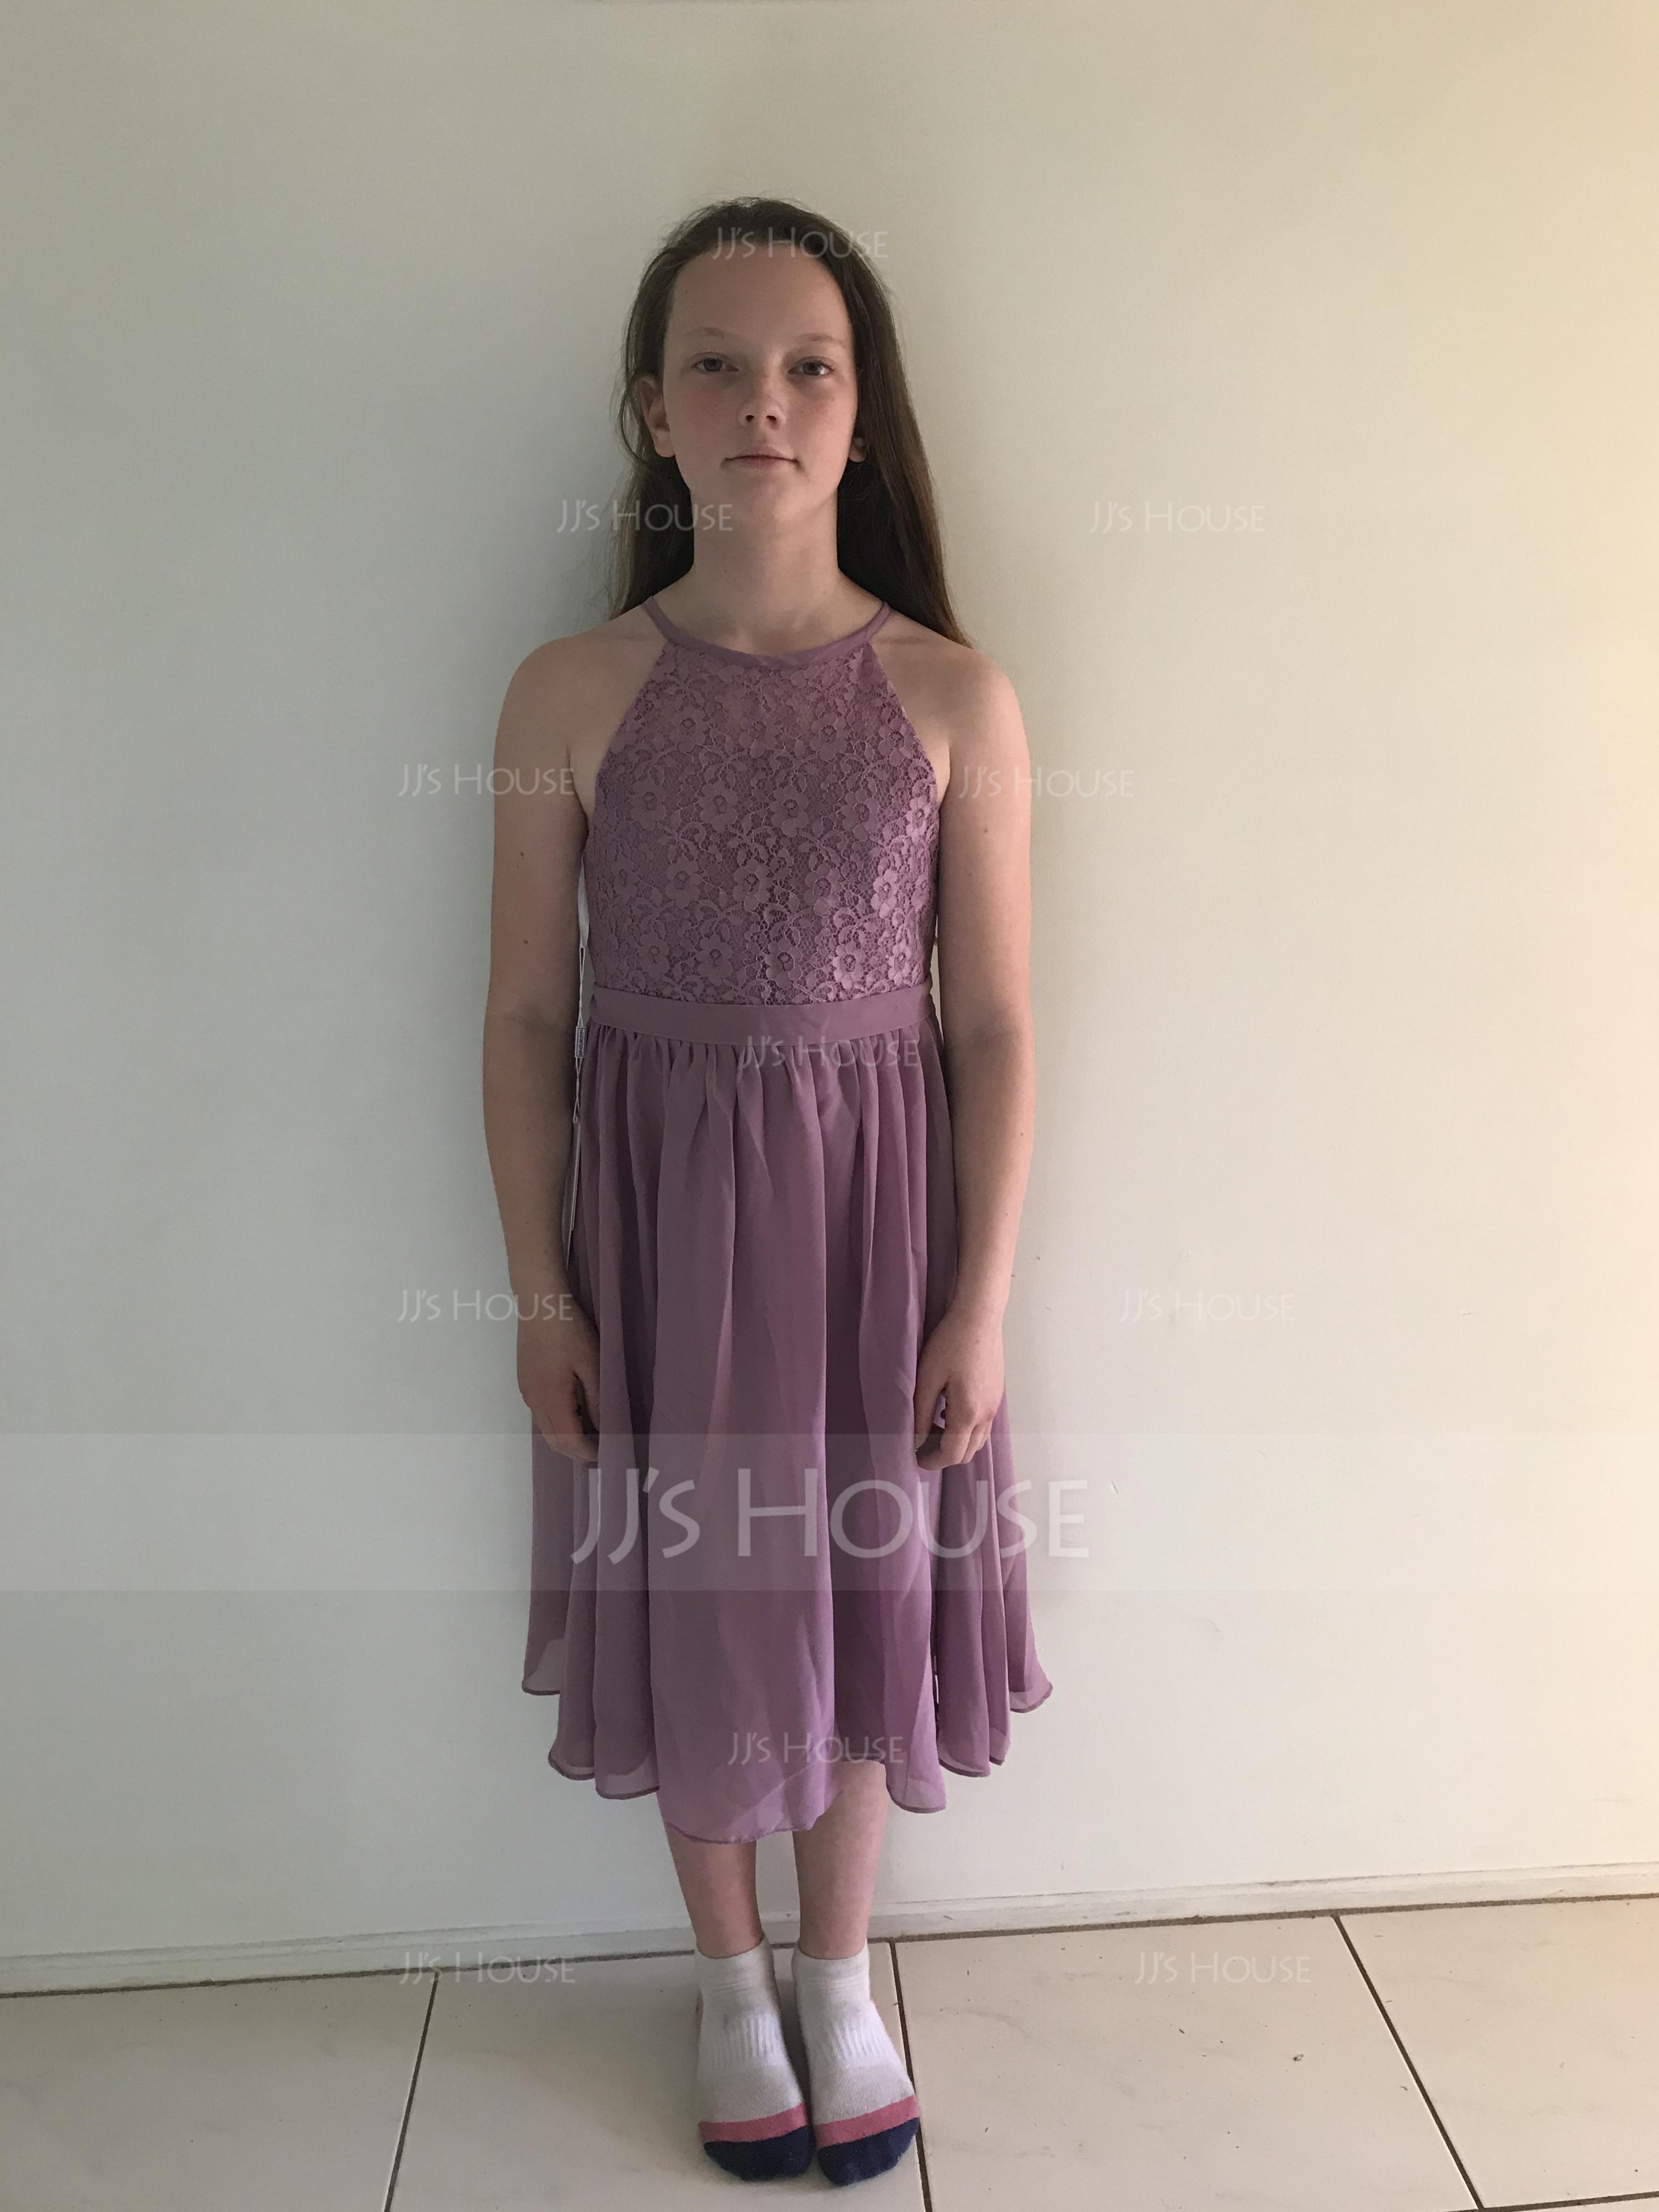 A-Line Scoop Neck Knee-Length Chiffon Junior Bridesmaid Dress (009119575)